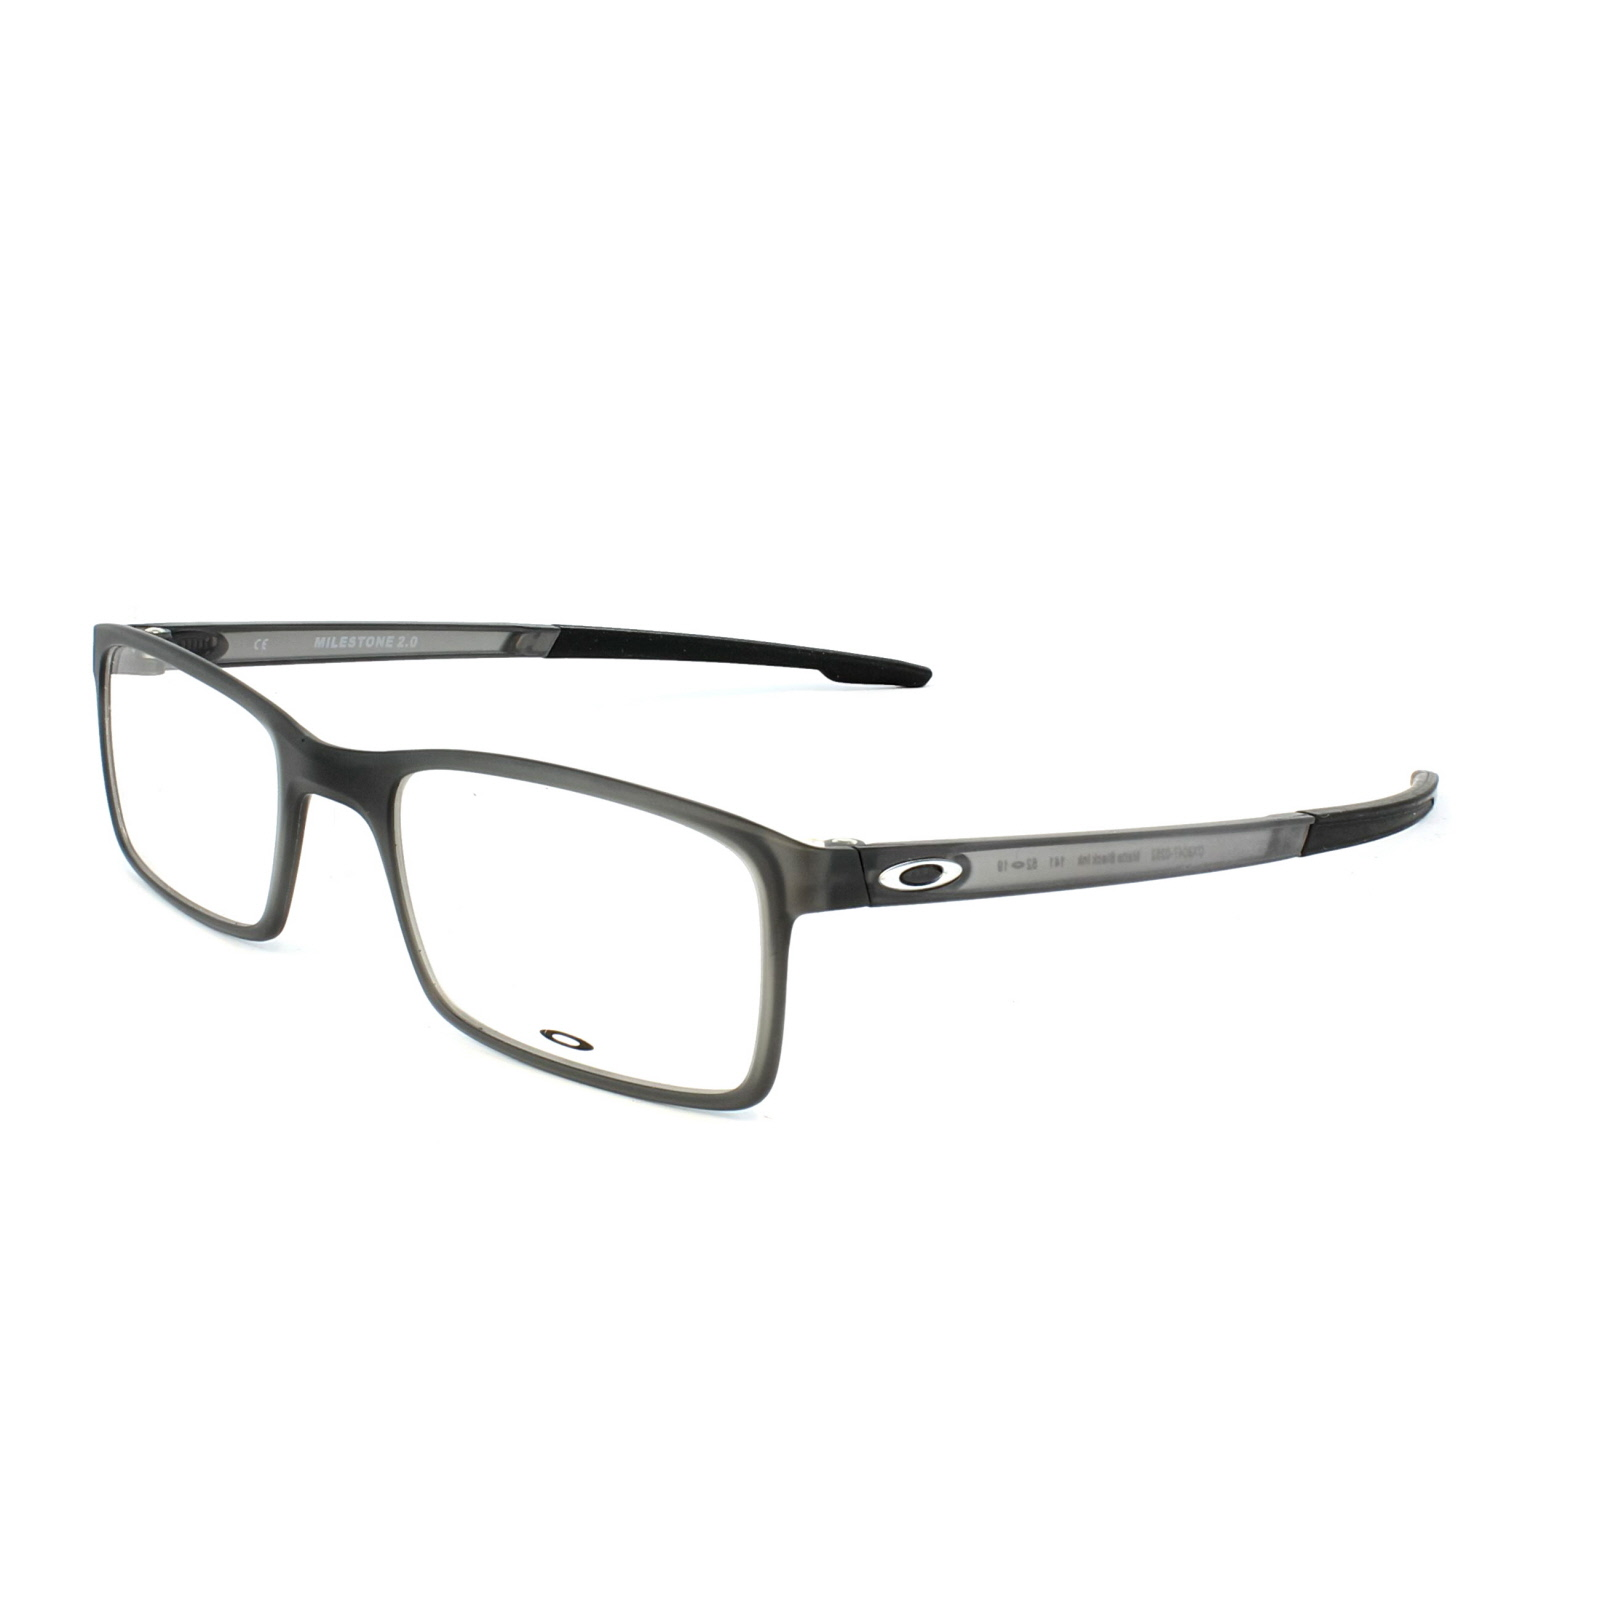 Cheap Oakley Milestone 2 0 Glasses Frames Discounted